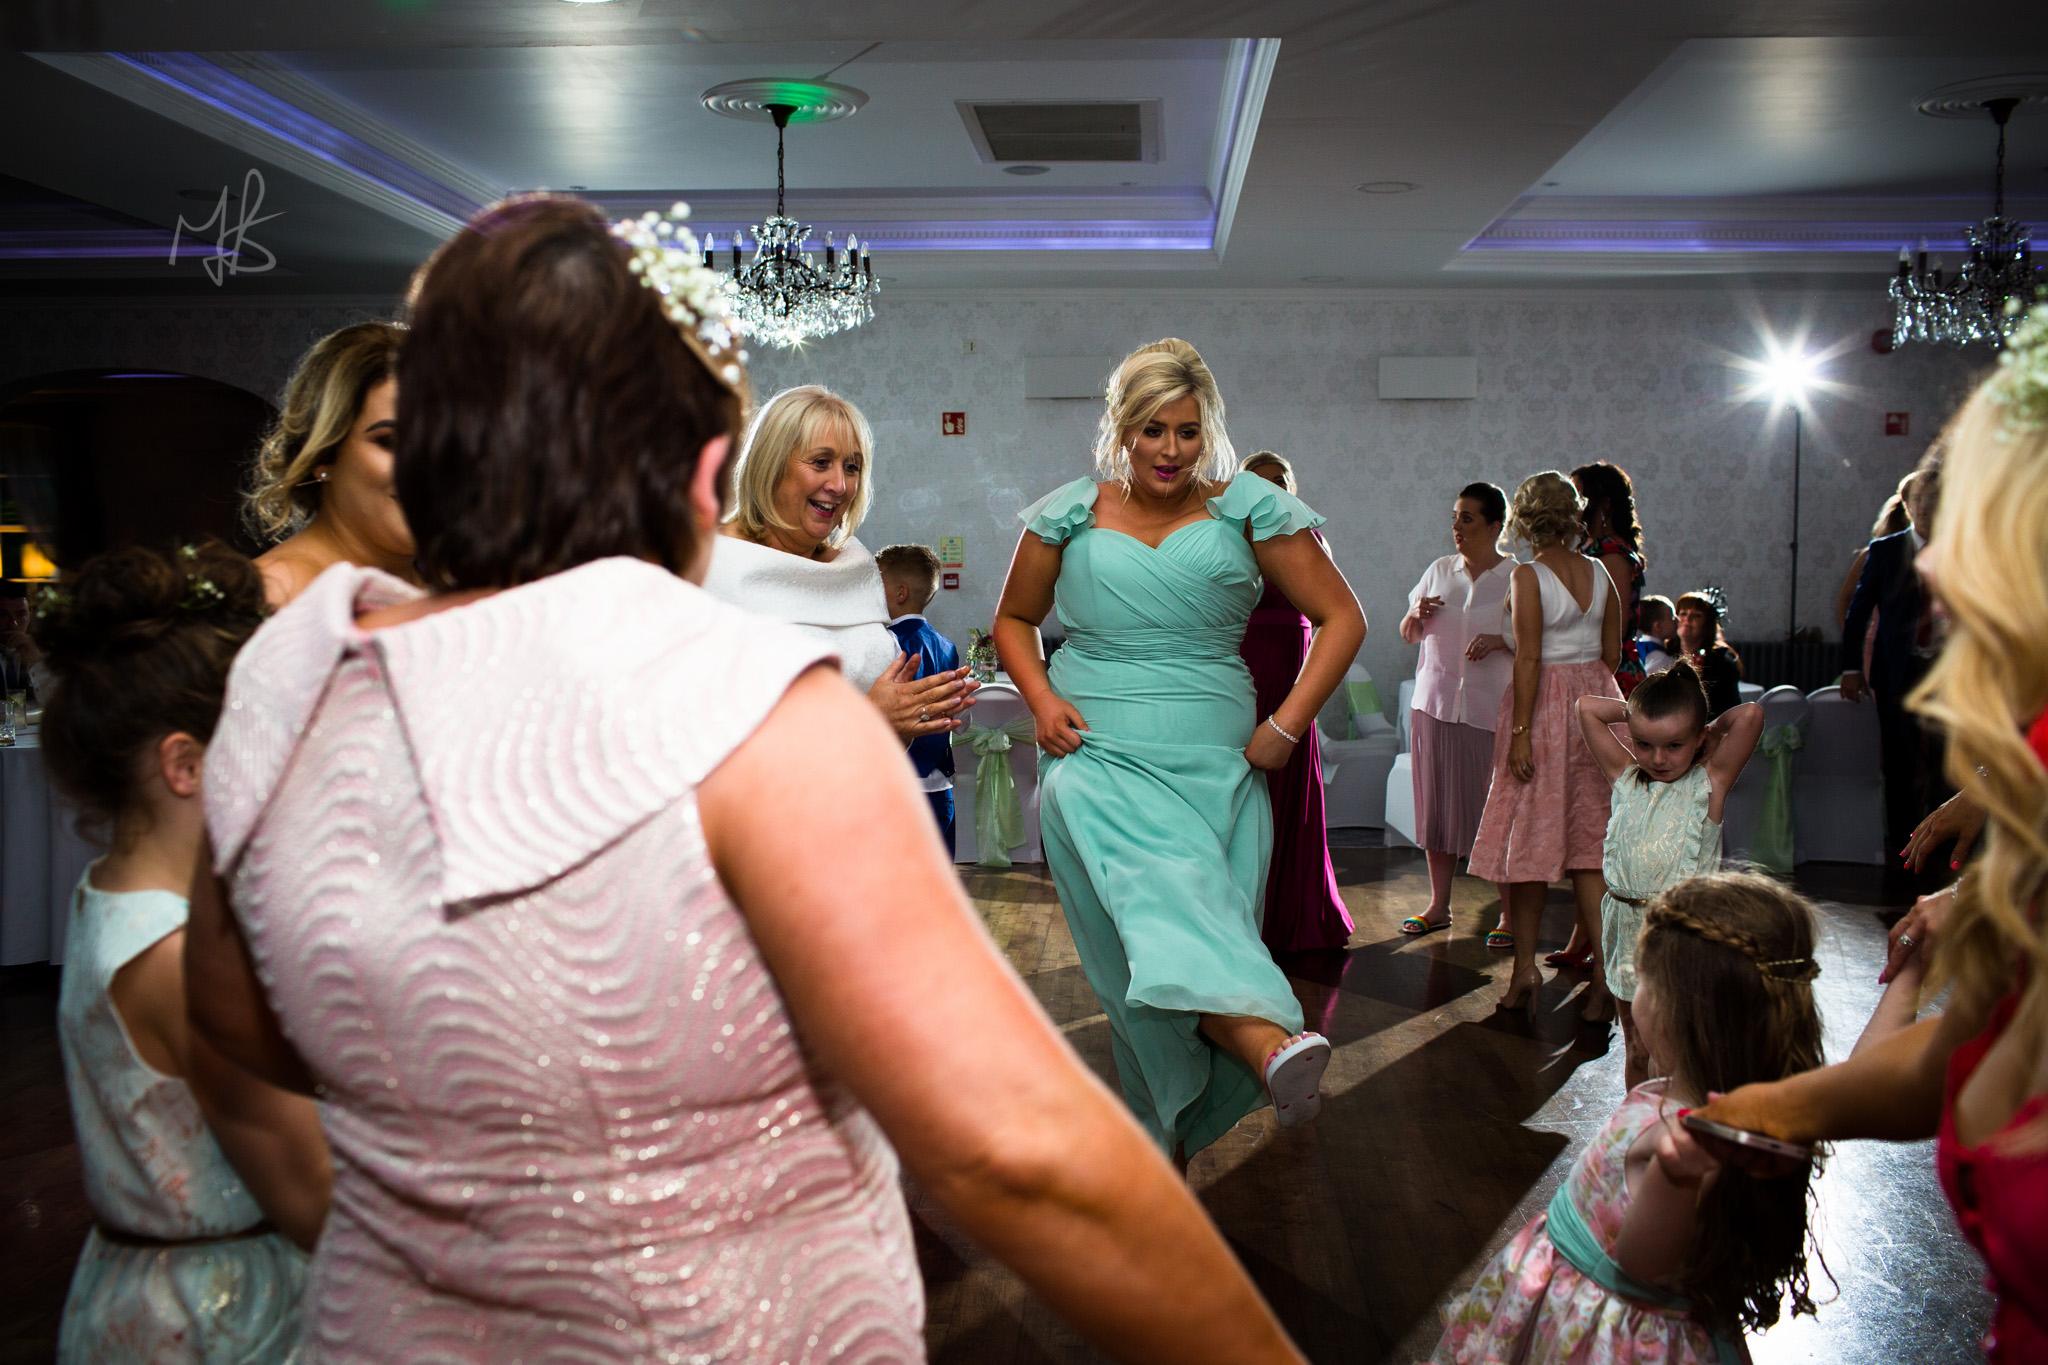 Northern-Ireland-Wedding-Photographer-Mark-Barnes-Ballymena_wedding-photography-Leighinmohr-House-Seamas_Alanna_For-web-67.jpg